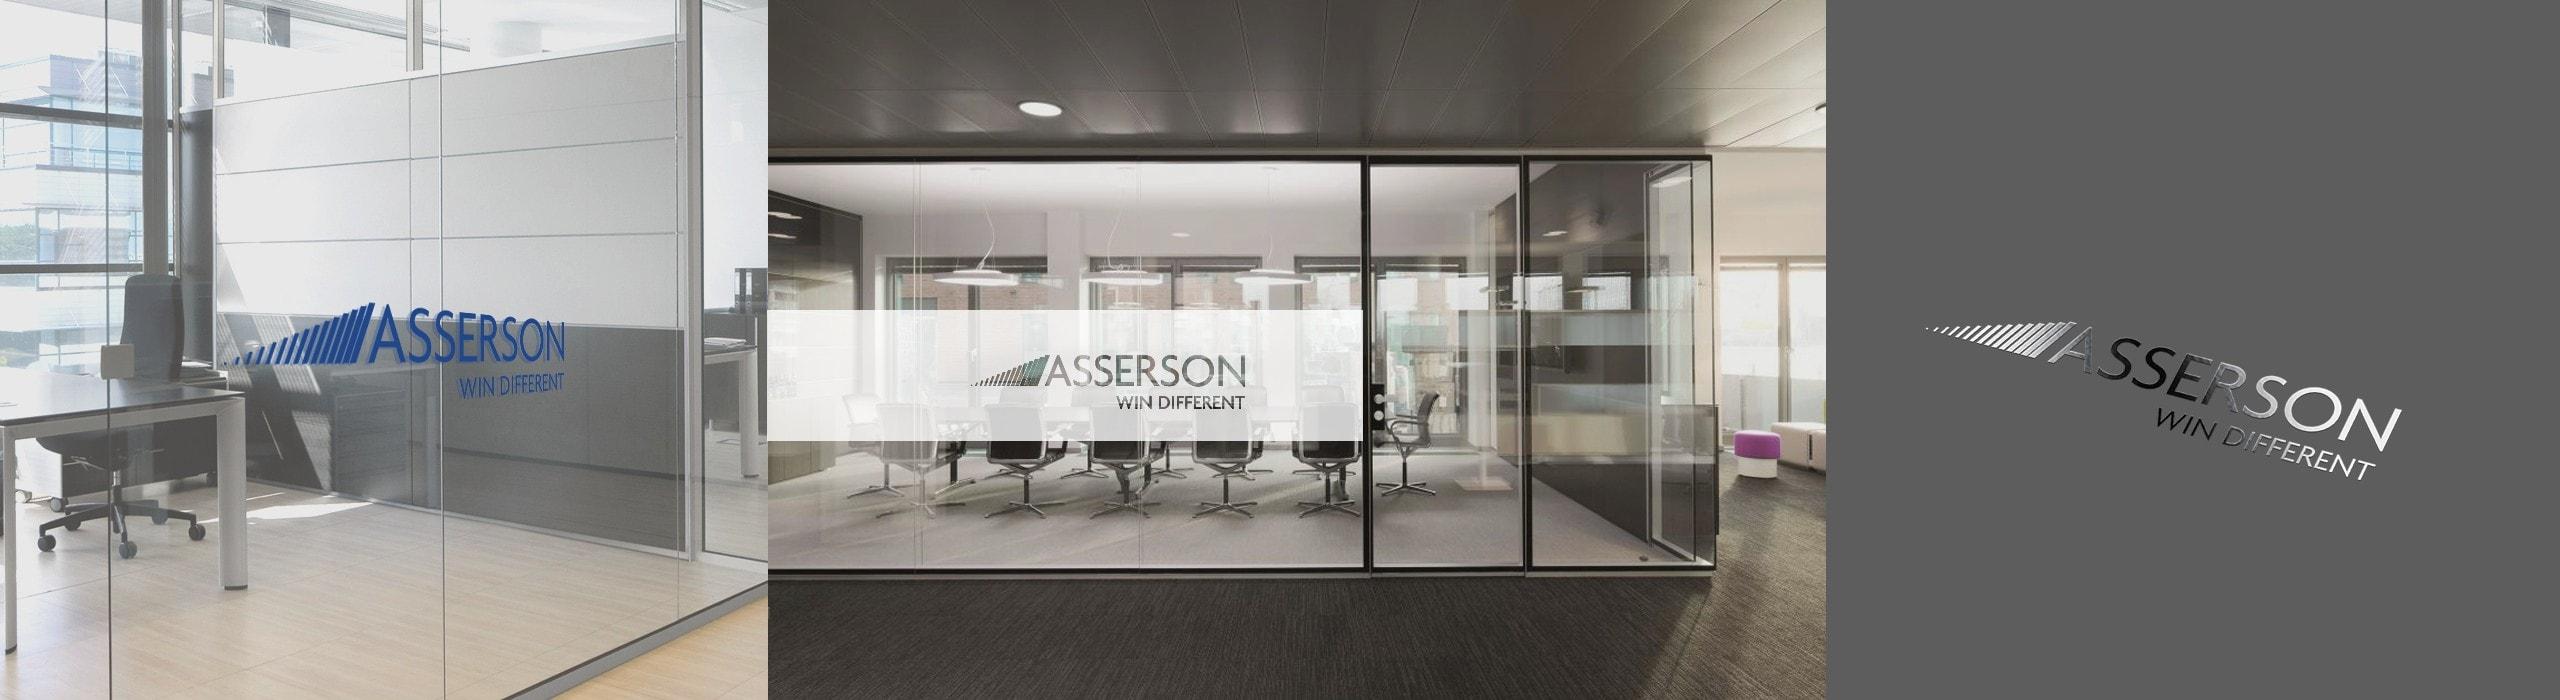 Asserson - natie-asserson-office - Natie Branding Agency